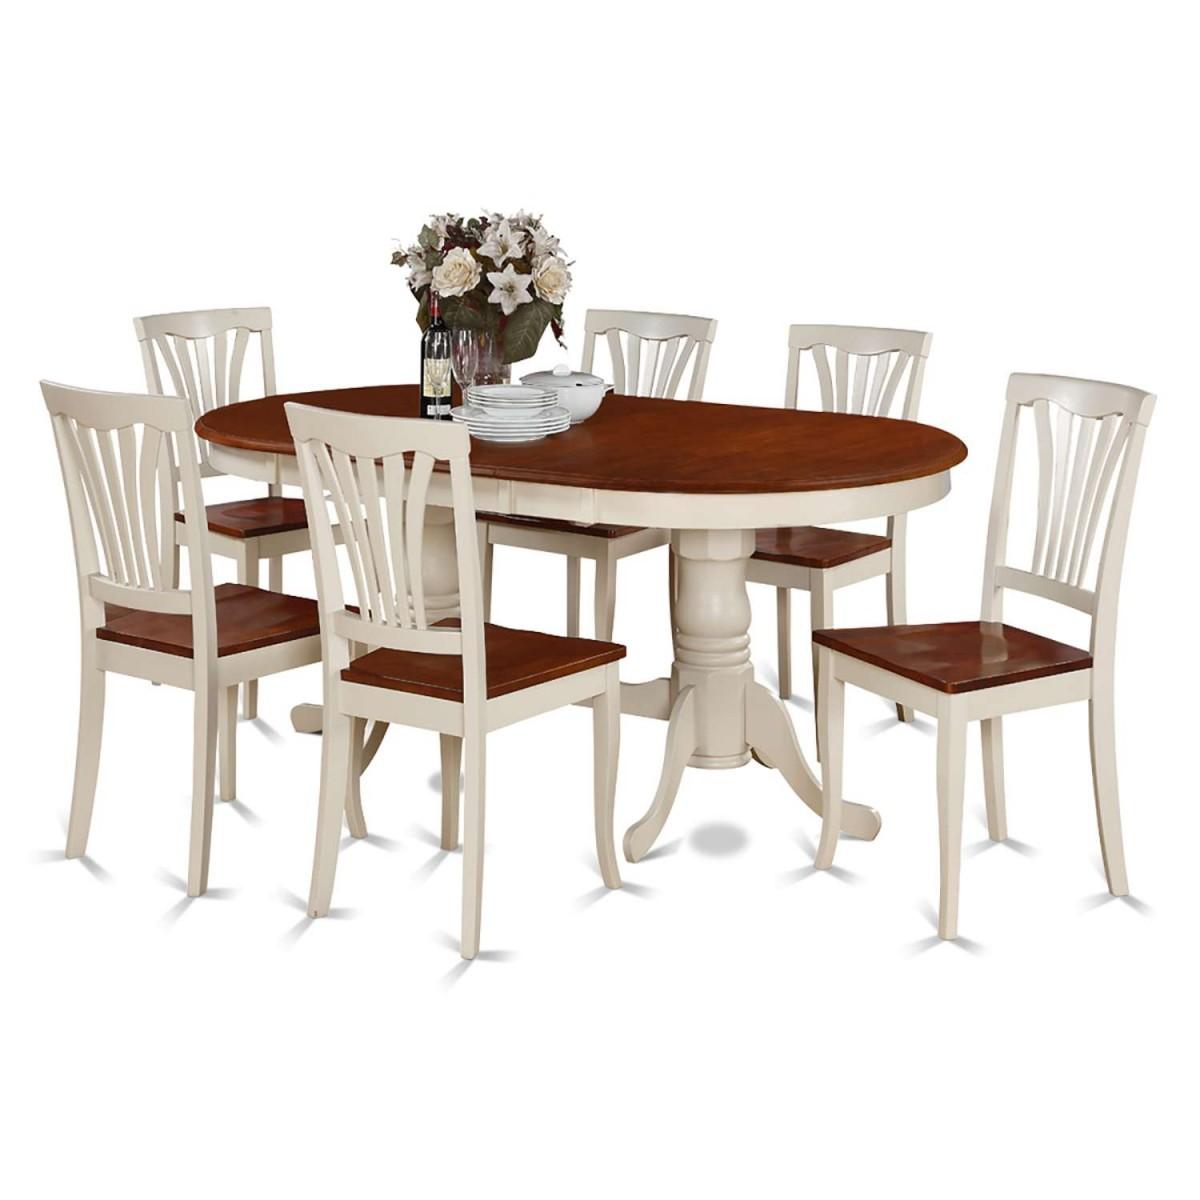 Cheap 7 Piece Dining Sets: East West Furniture Plainville 7 Piece Dining Set